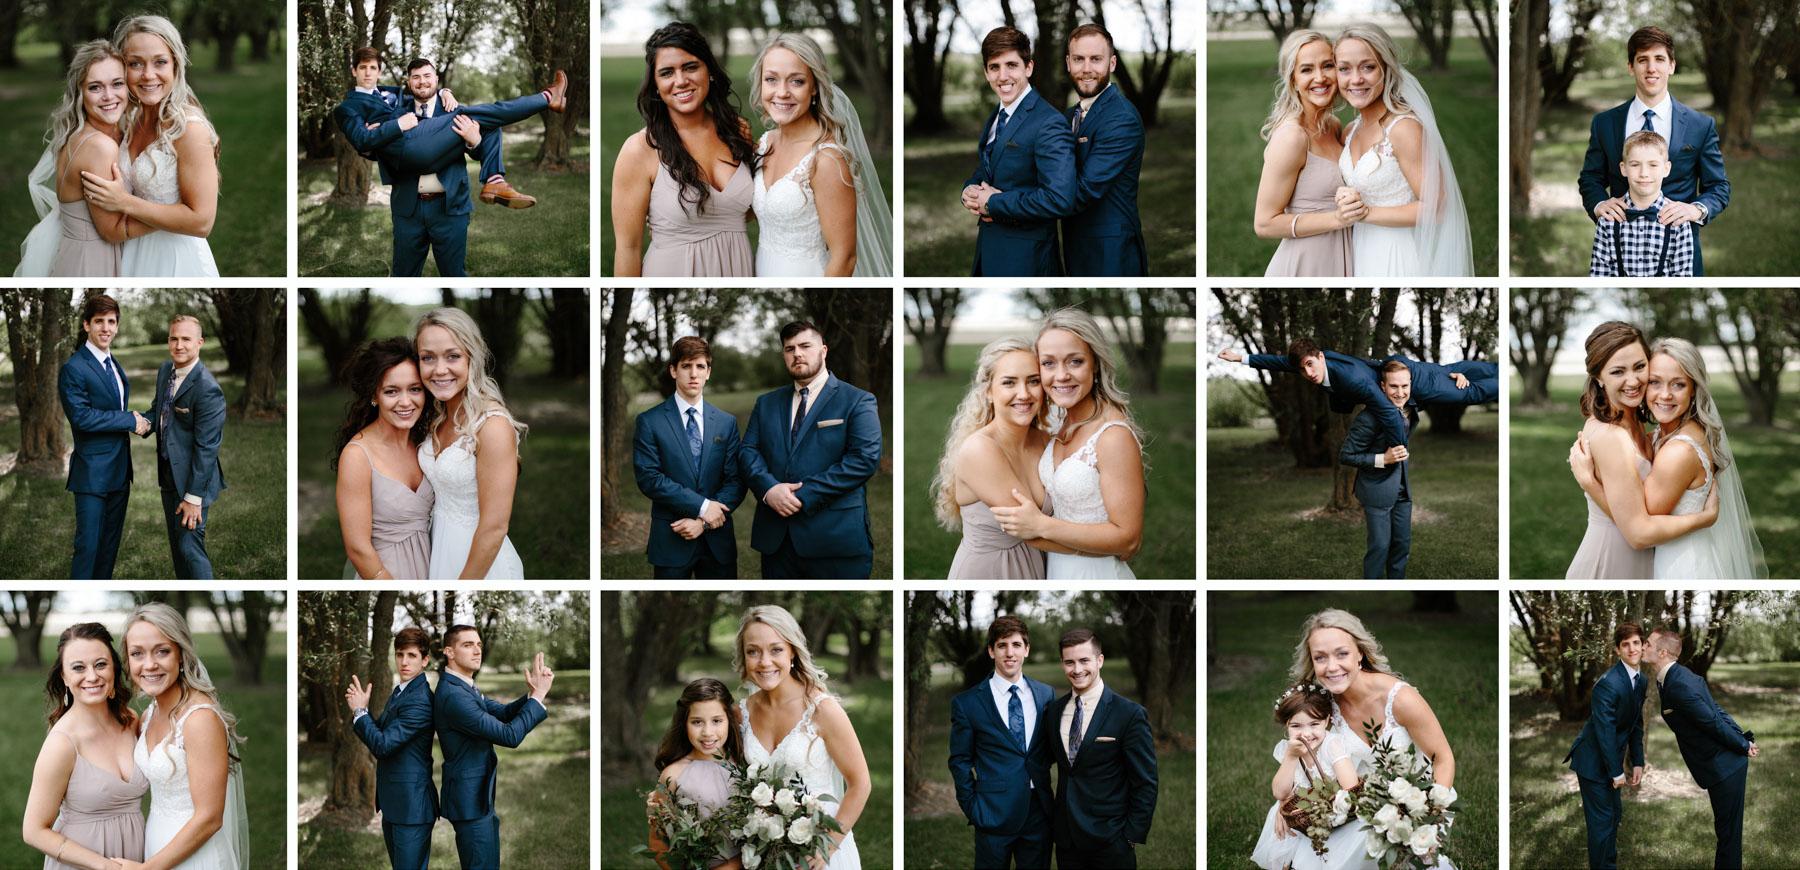 Intimate_Farmhouse_SD_Wedding_Bridgette_Philip_034.jpg